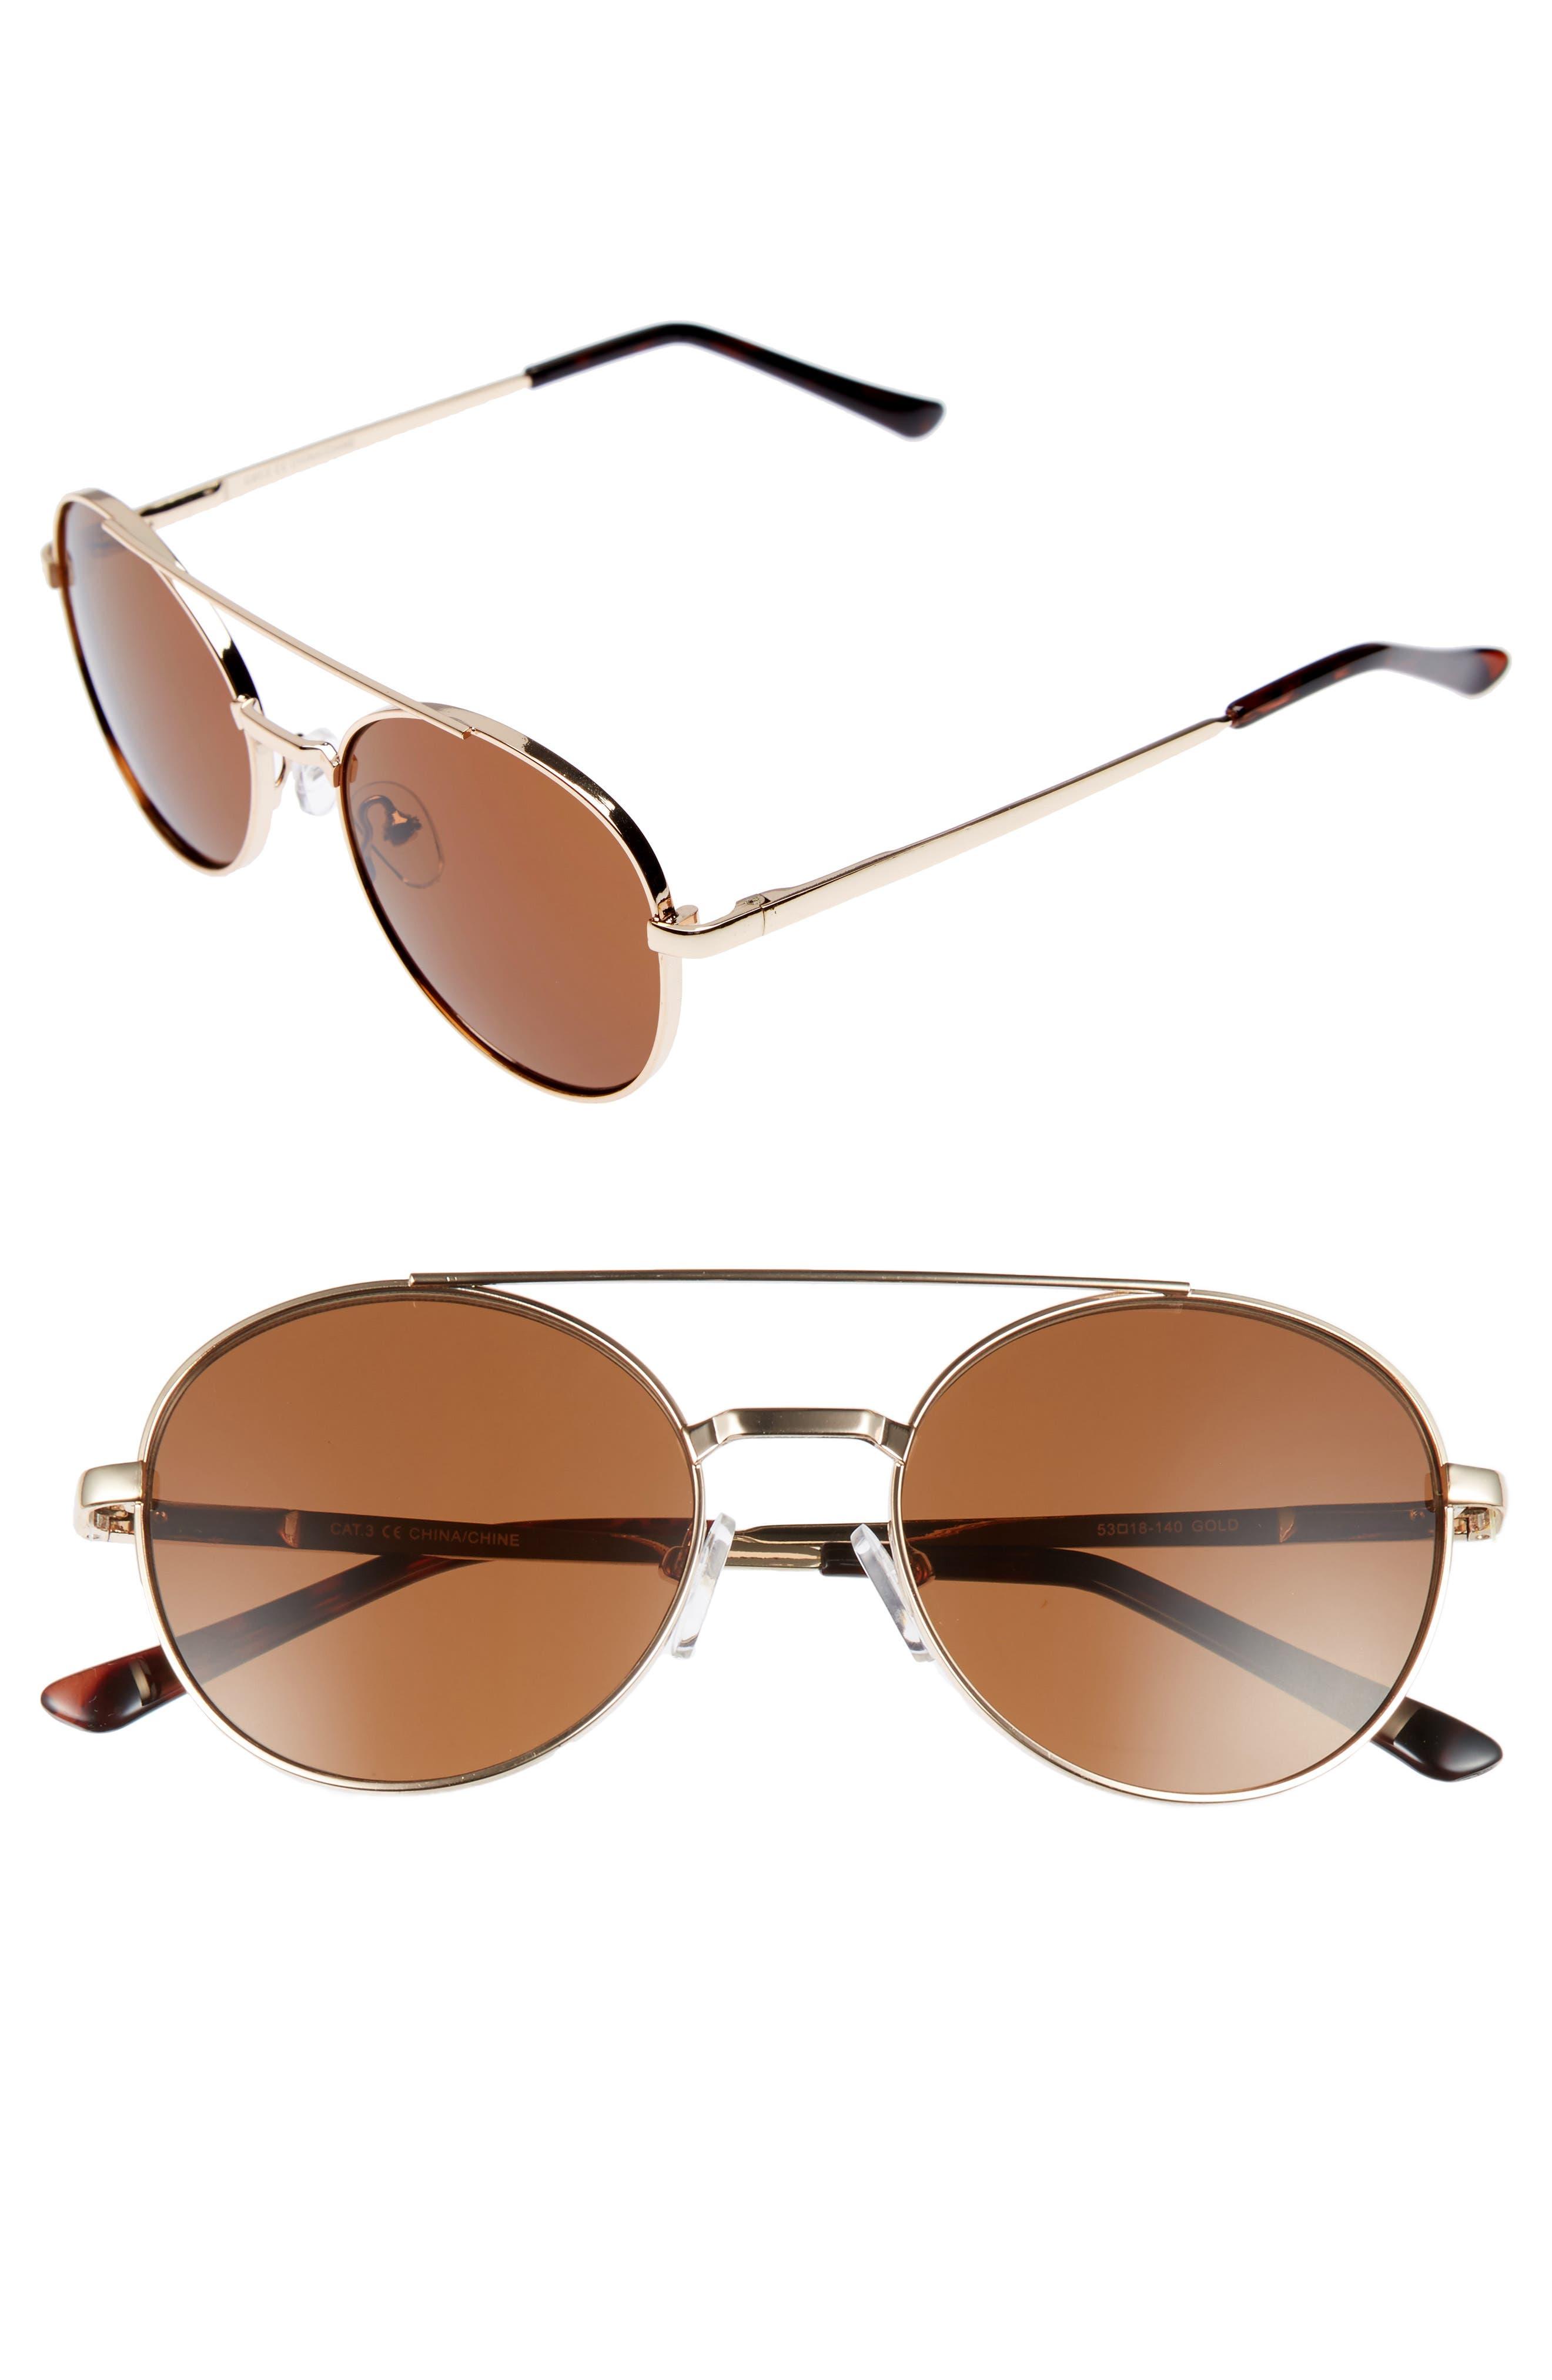 Main Image - 1901 Logan 52mm Sunglasses